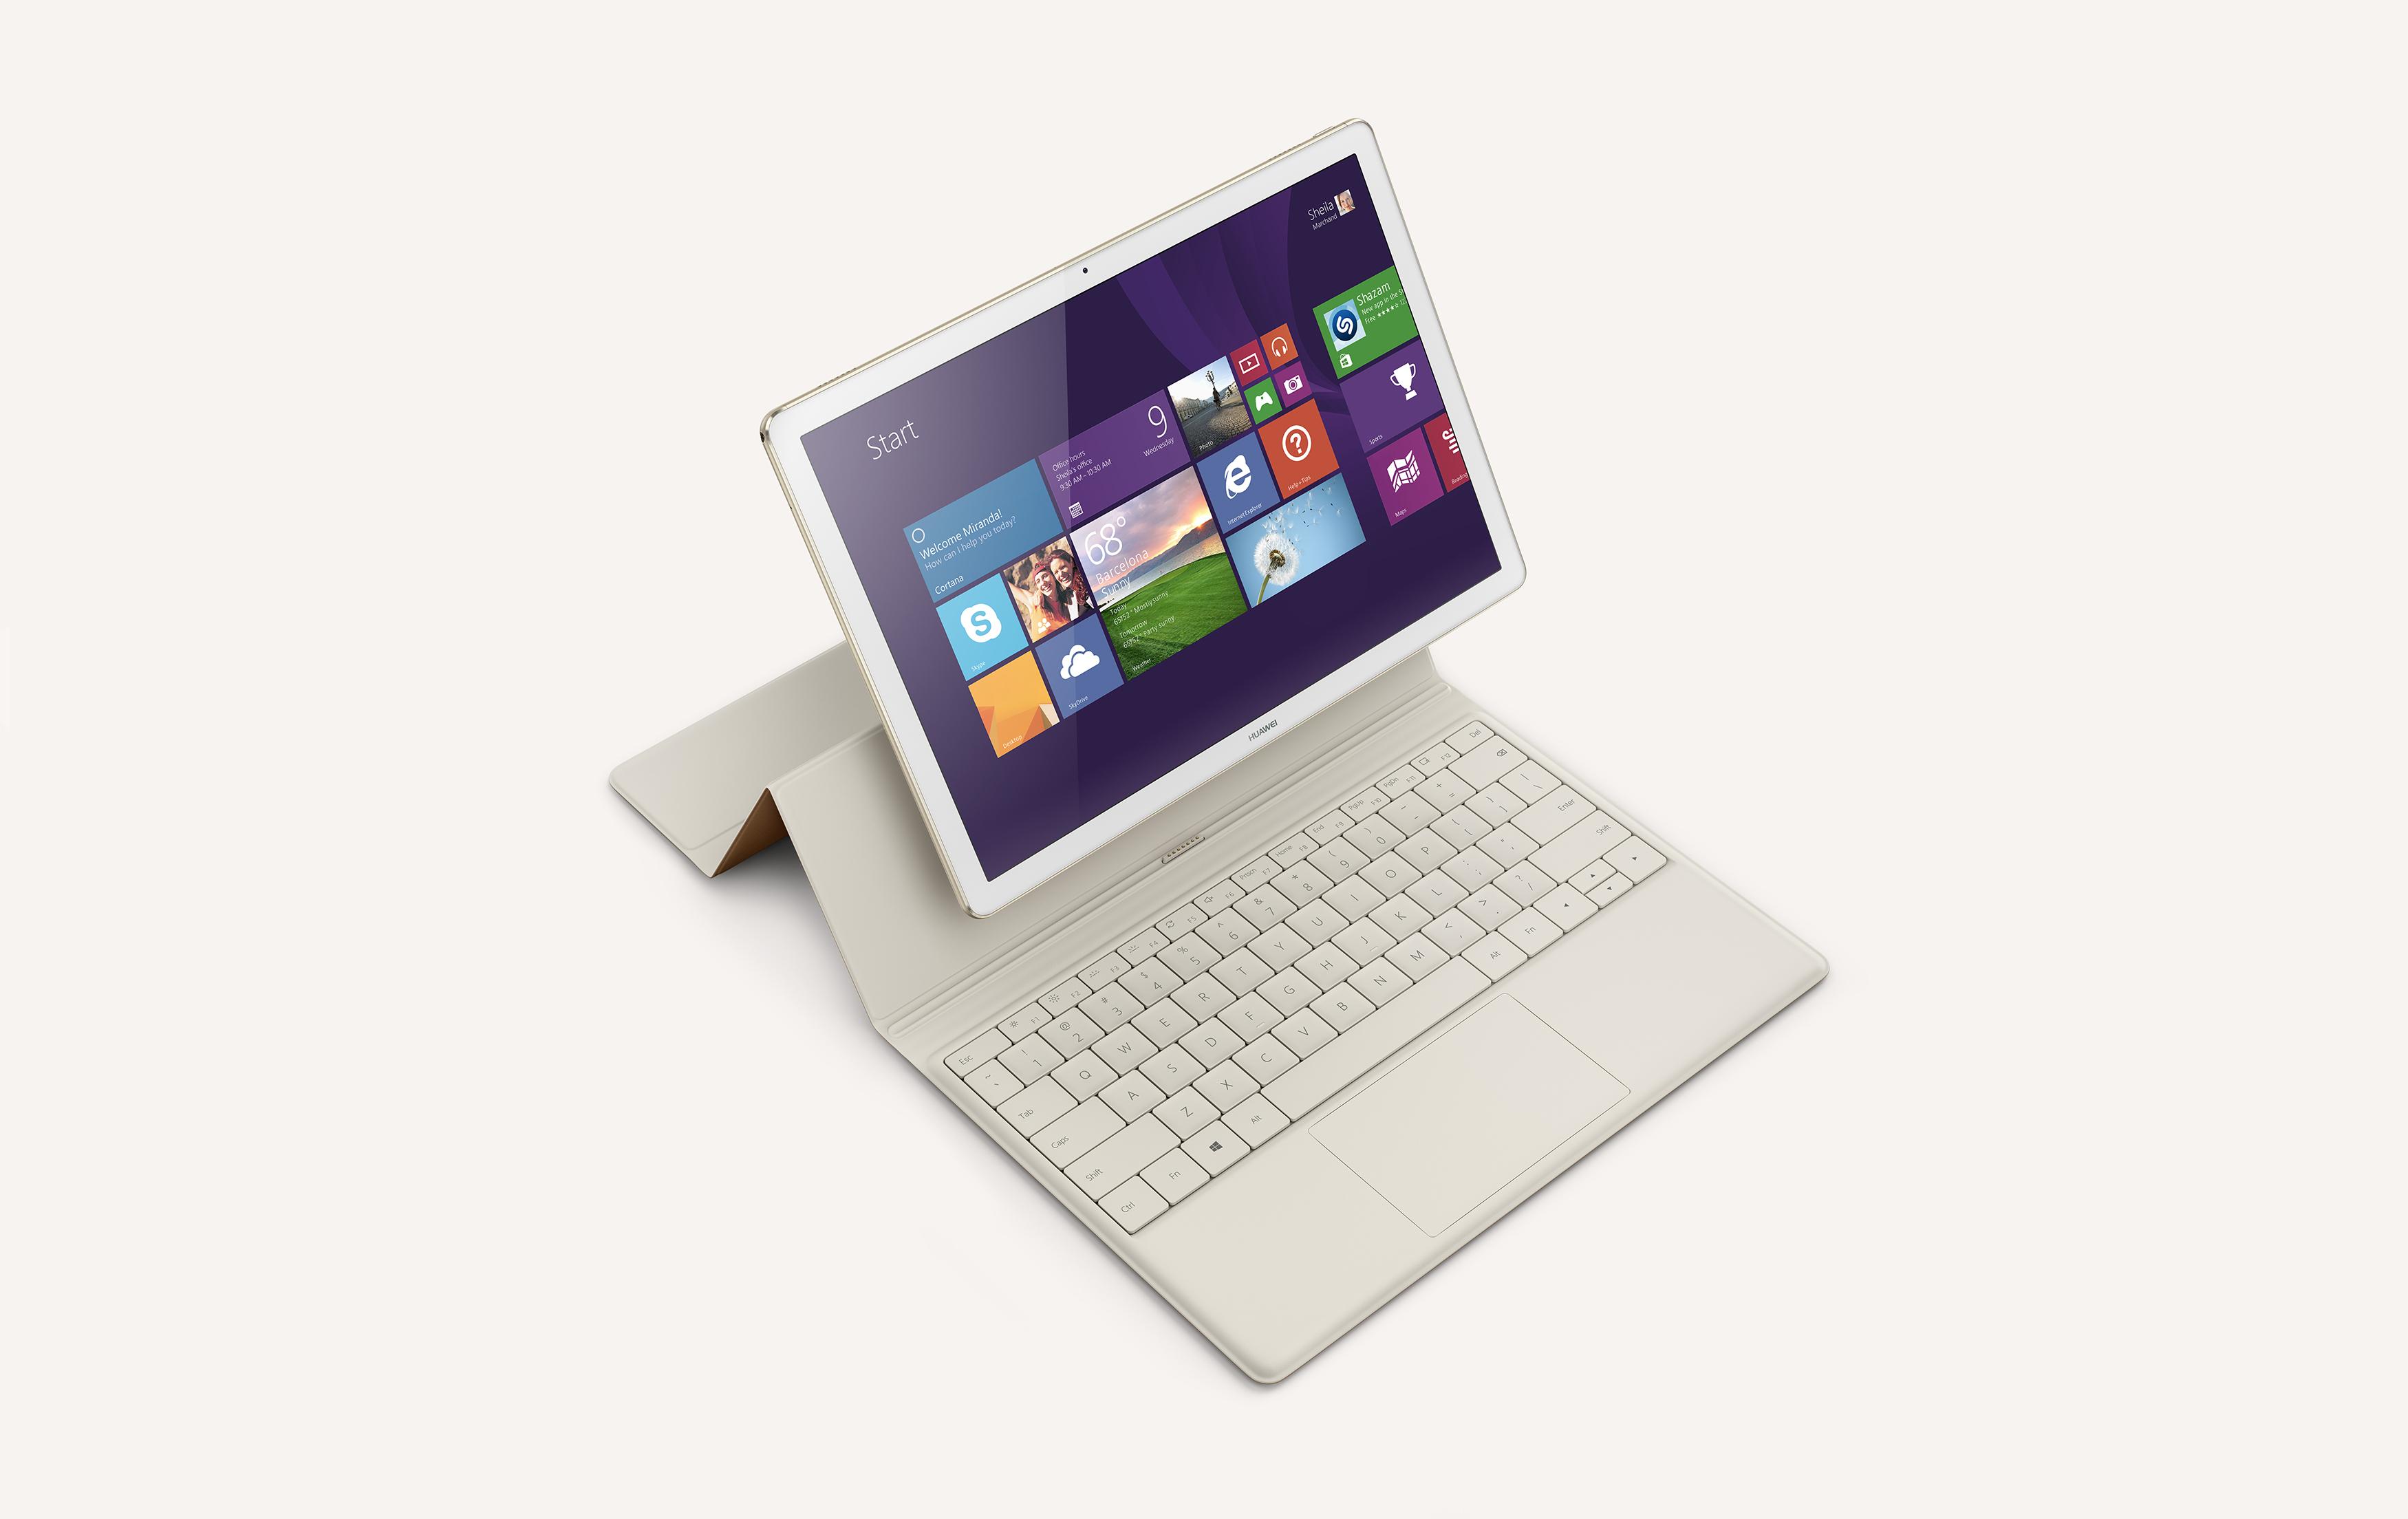 Huawei MateBook 2 (Photo: Business Wire)